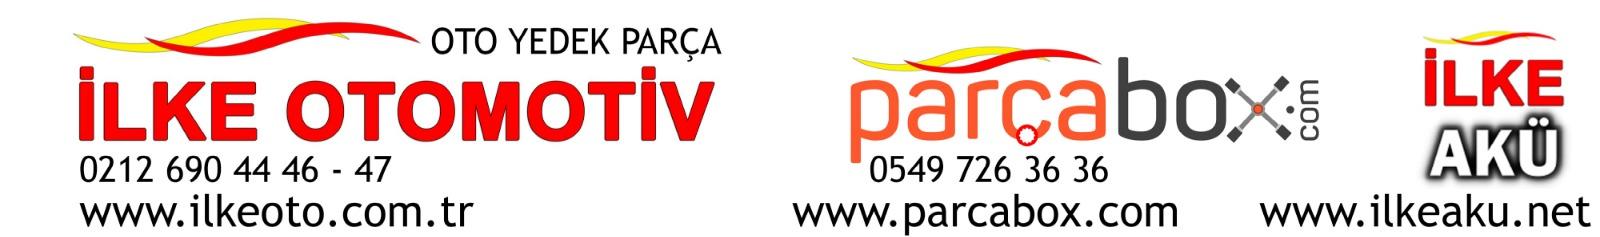 İLKE OTOMOTİV parcabox.com İLKE AKÜ